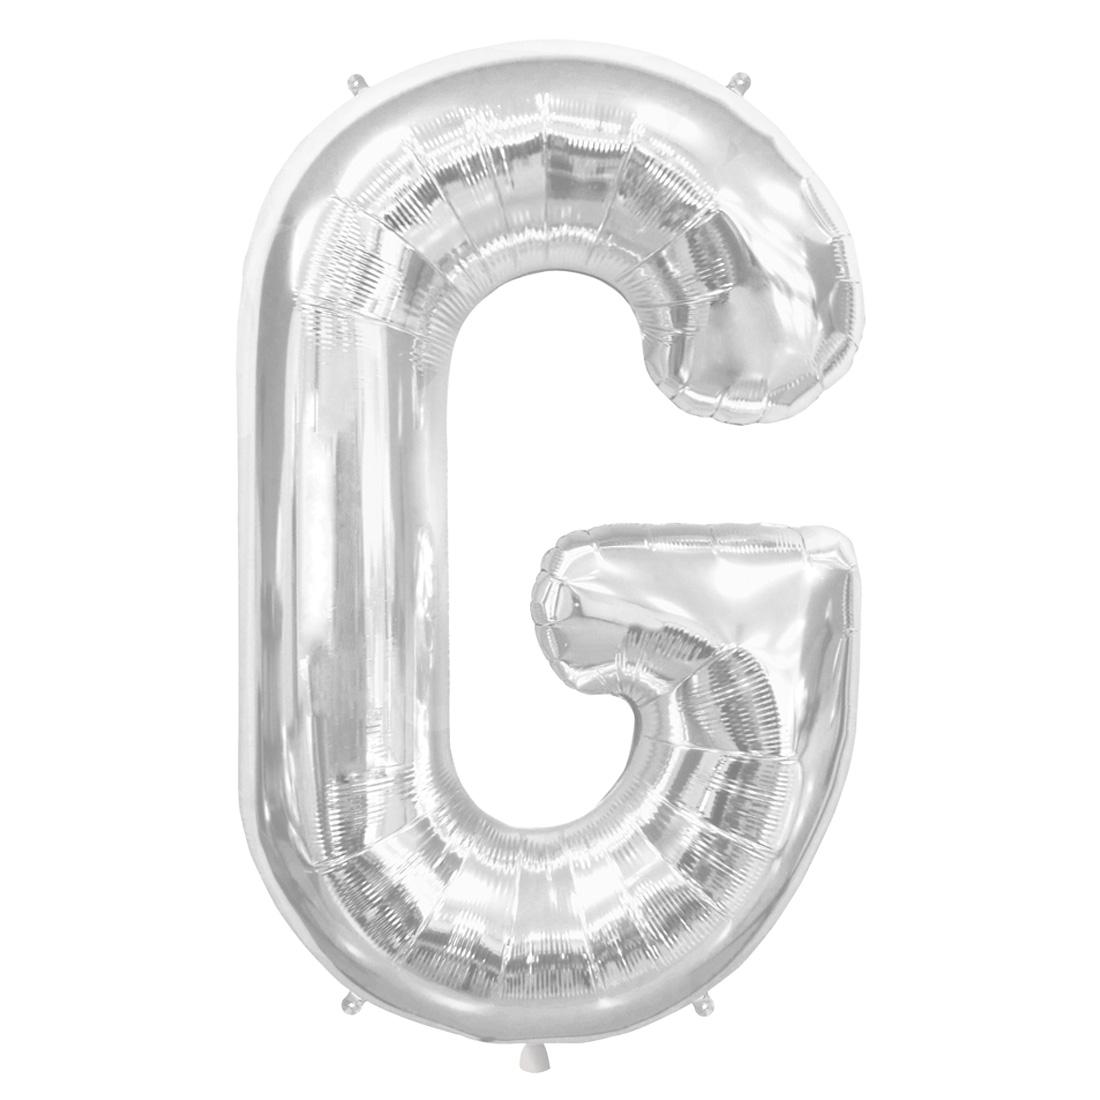 "Northstar Alphabet Letter G Shape Solid Jumbo Helium 34"" Foil Balloon, Silver"